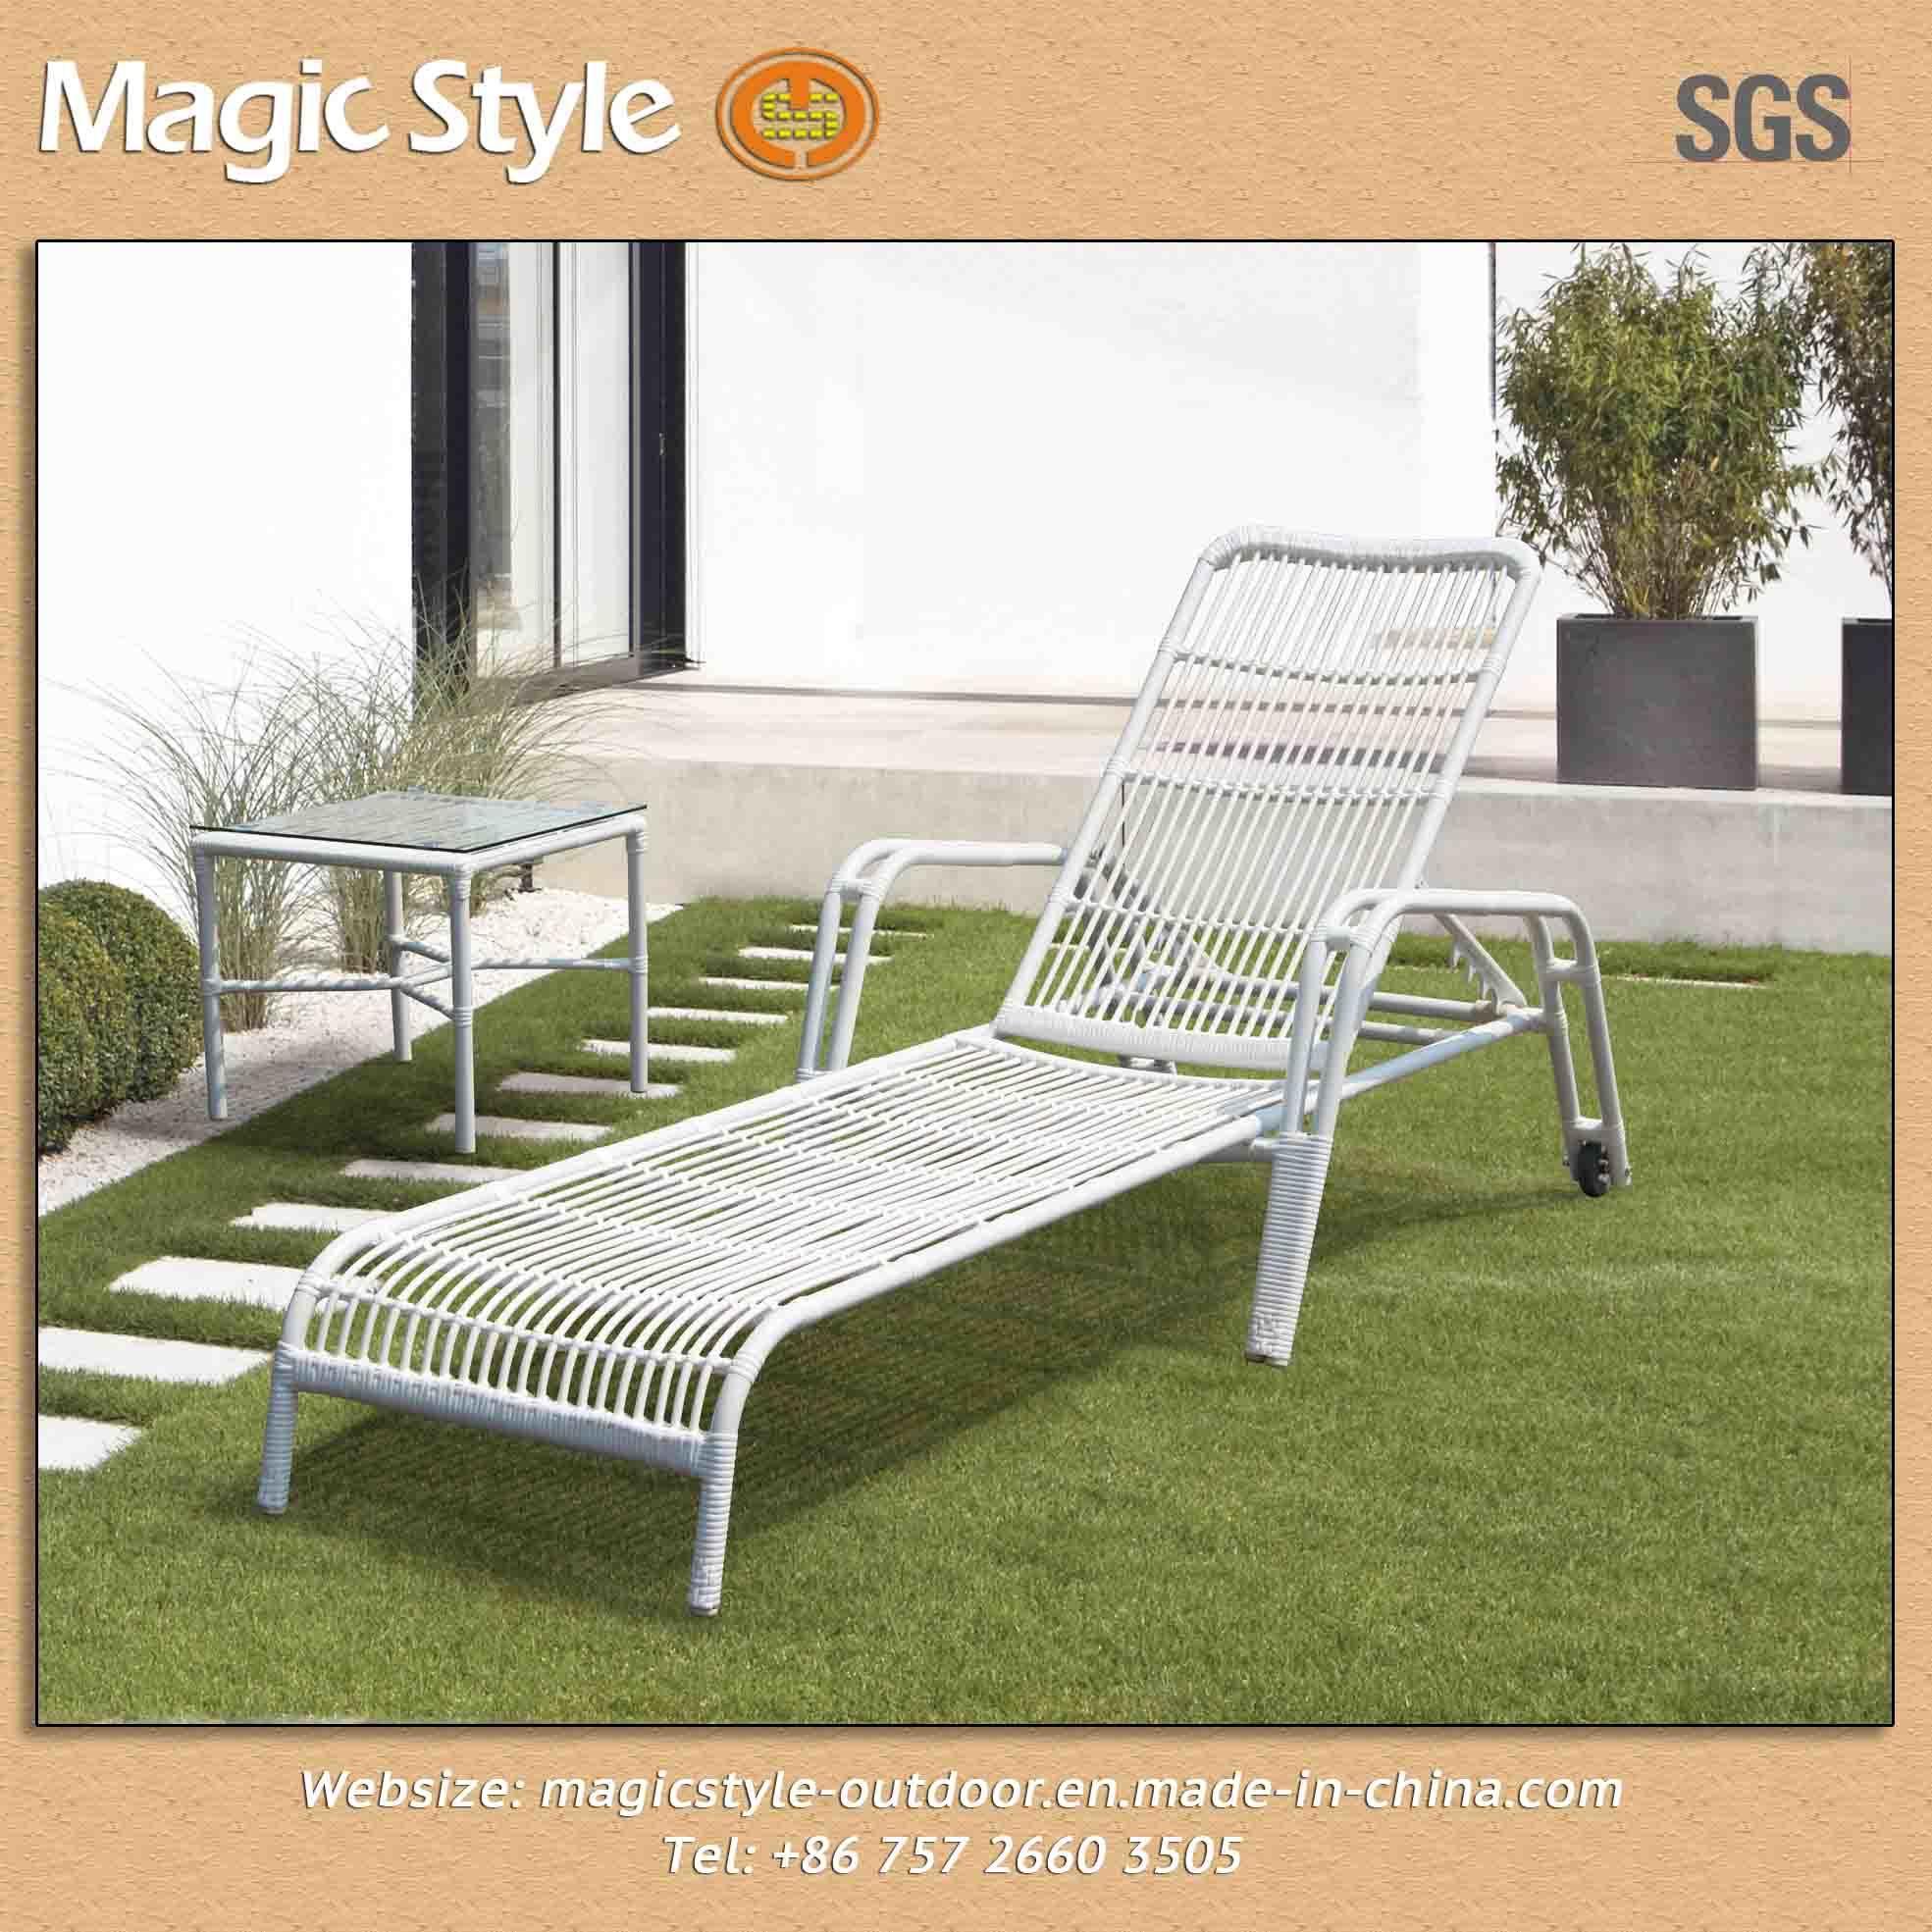 China 2013 New Design Outdoor Sunlounger Rattan Sunbed Wicker Furniture Beach